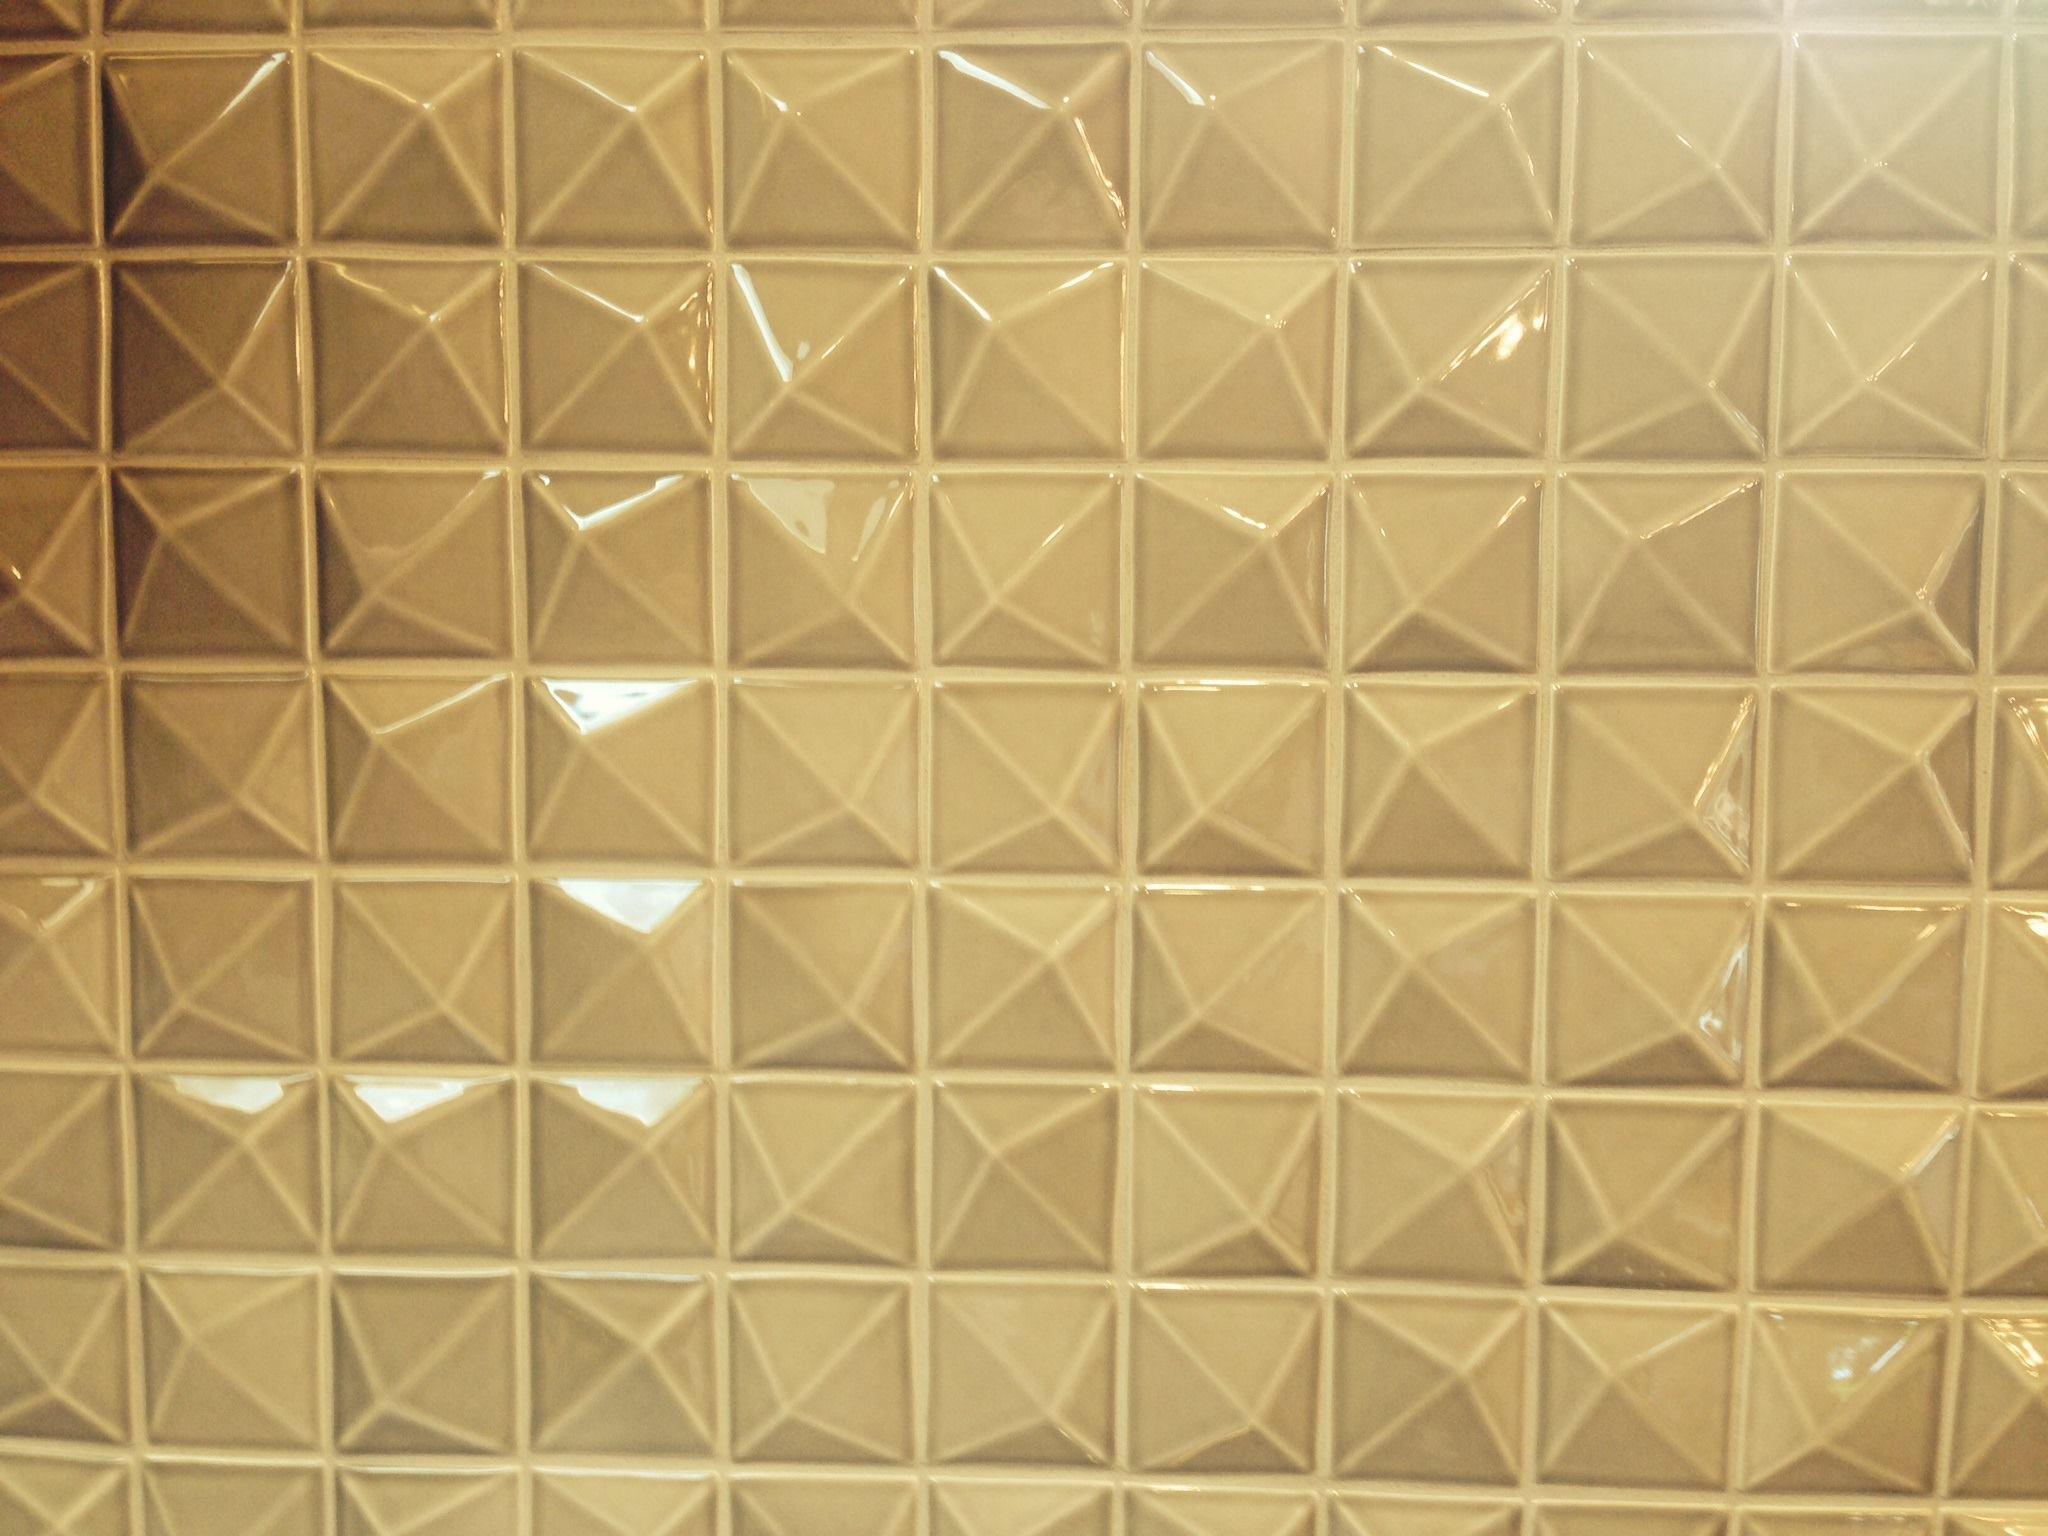 Pak clay wall kitchen tiles price in pakistan